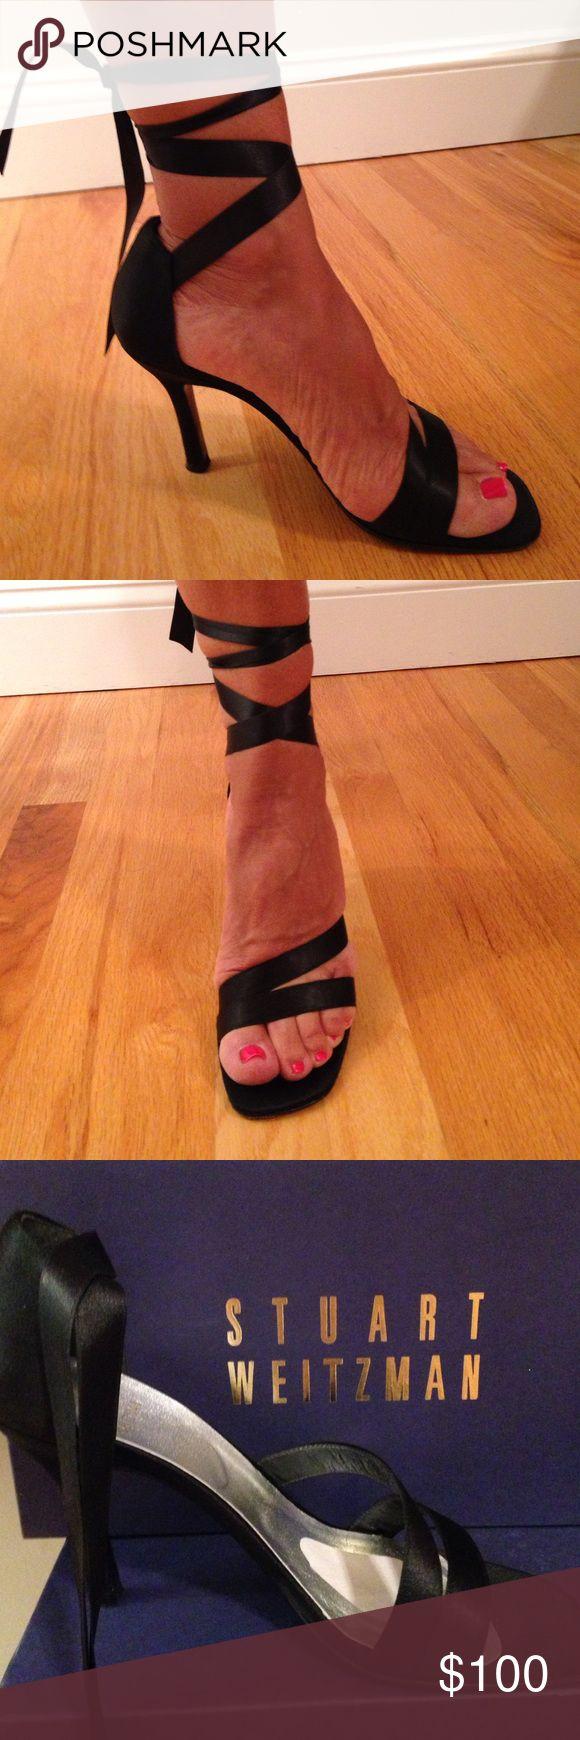 Shoes Stuart Weitzman wrap me up black satin Stuart Weitzman Shoes Heels